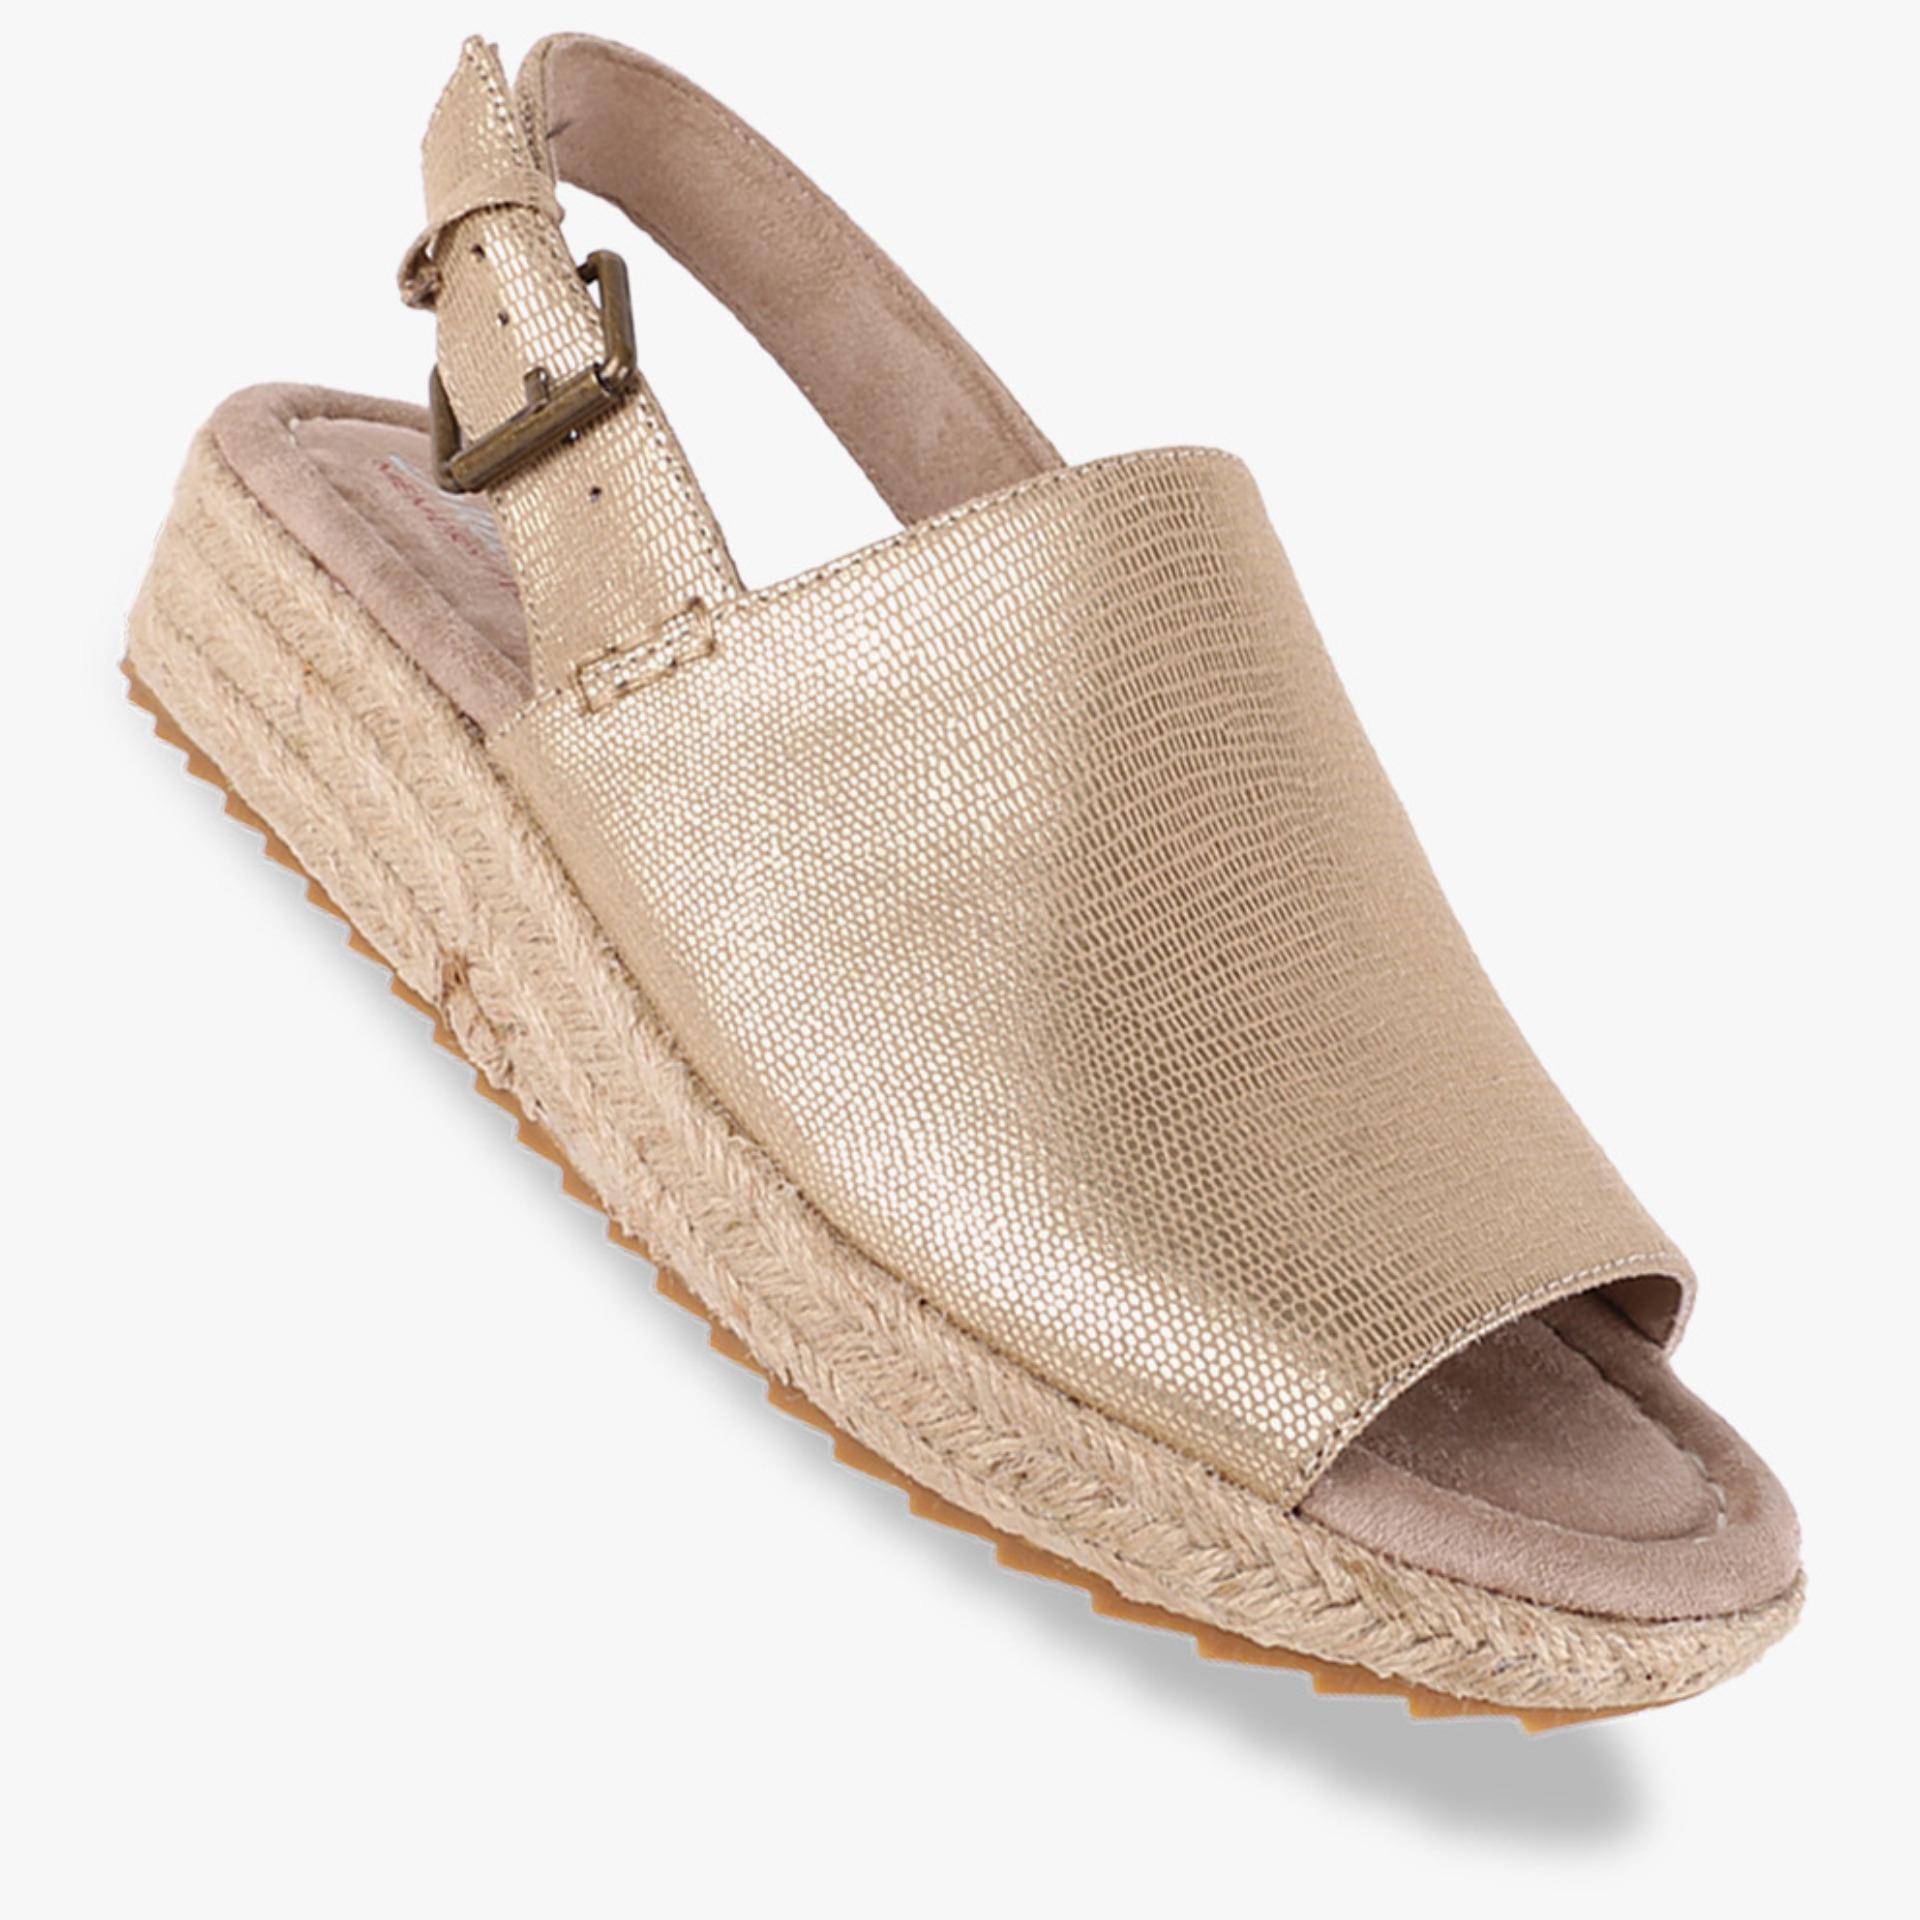 Beli Skechers Hashtag Social Calling Women S Sneakers Shoes Gold Murah